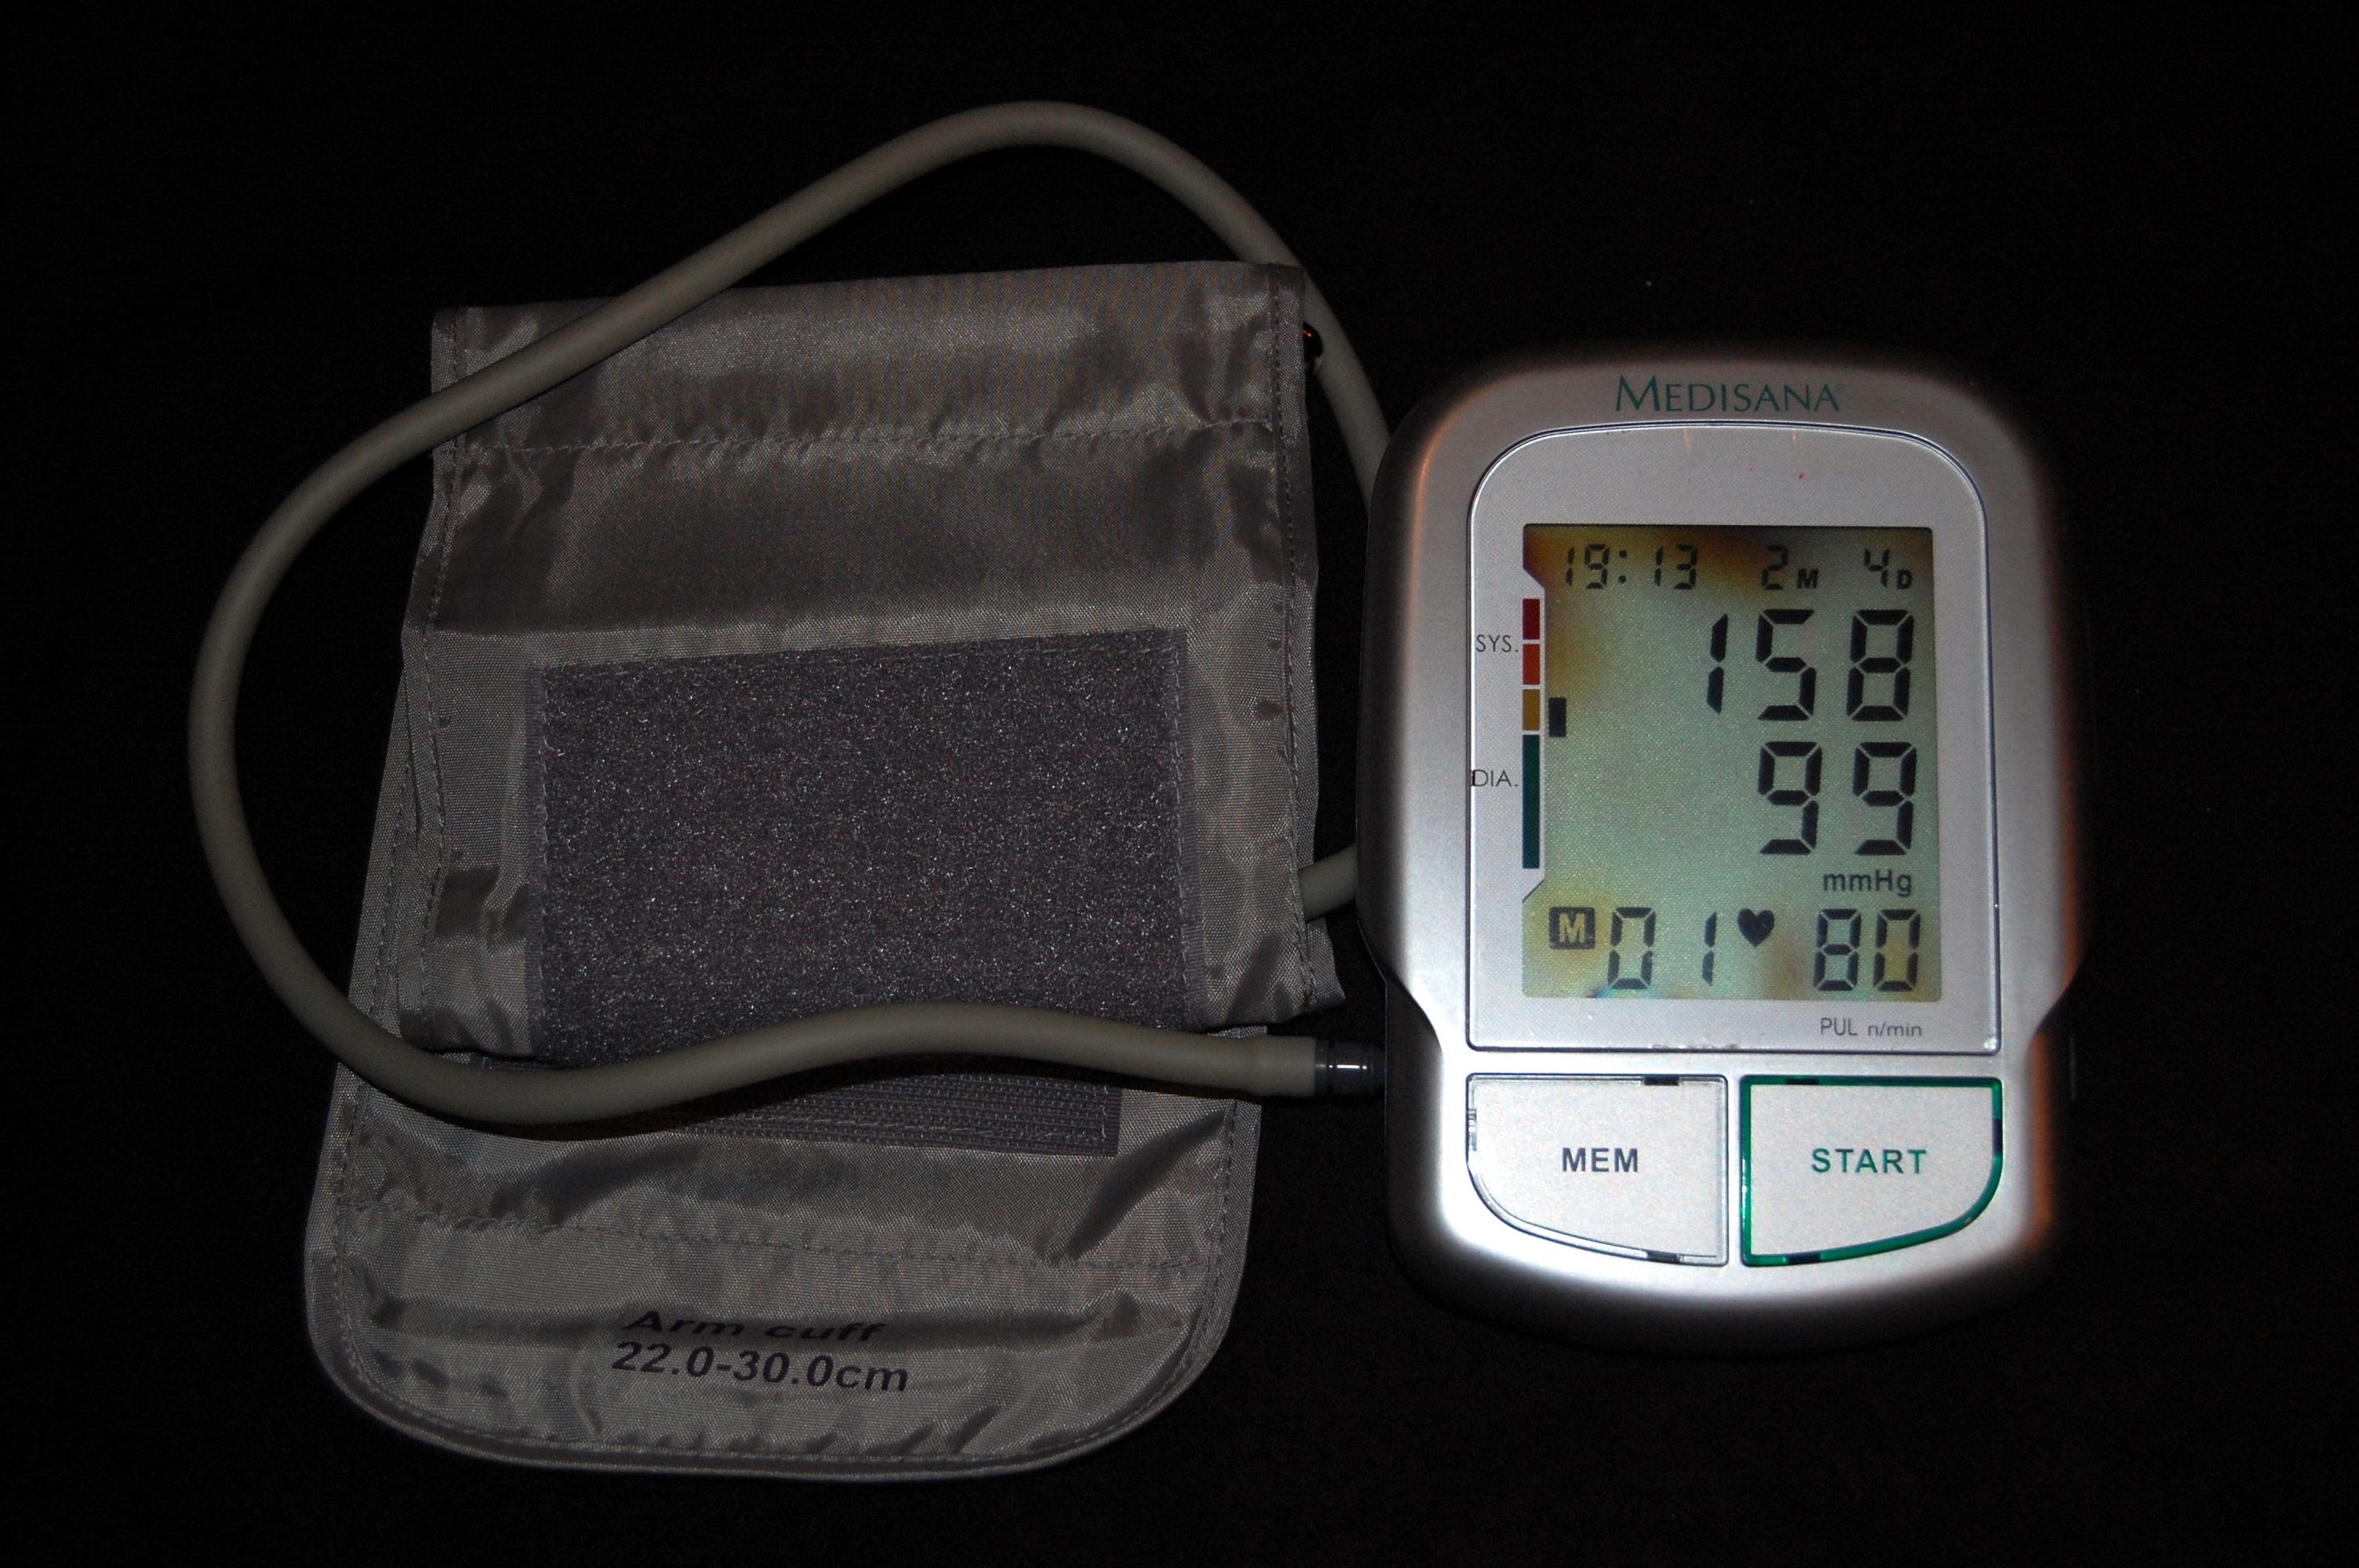 prvi hipertenzija tablete